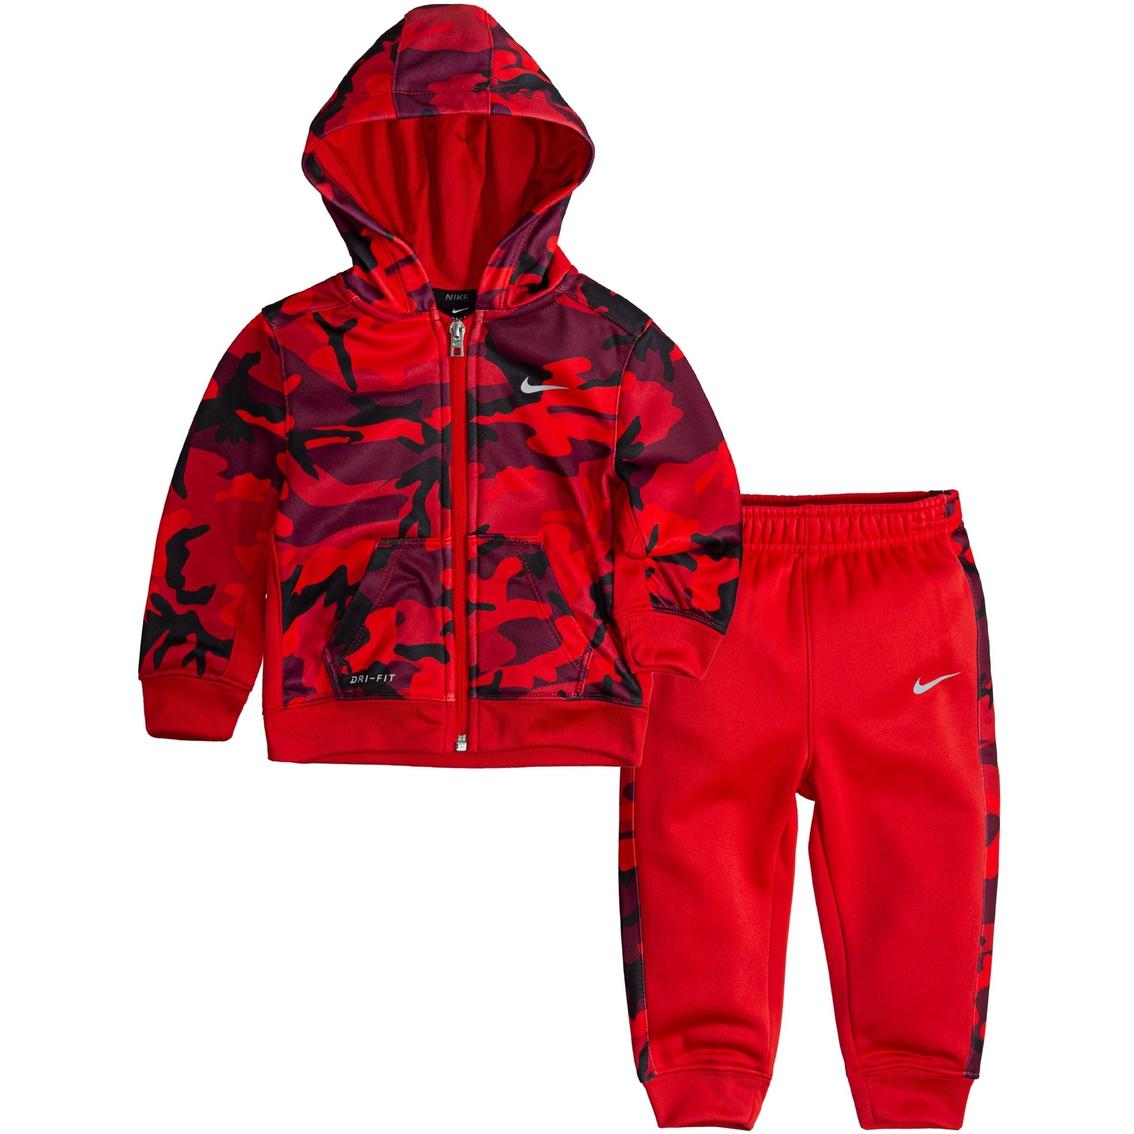 1b9afcdf4 Nike Infant Boys Camo Allover Print Full Zip Therma Set | Baby Boy 0 ...